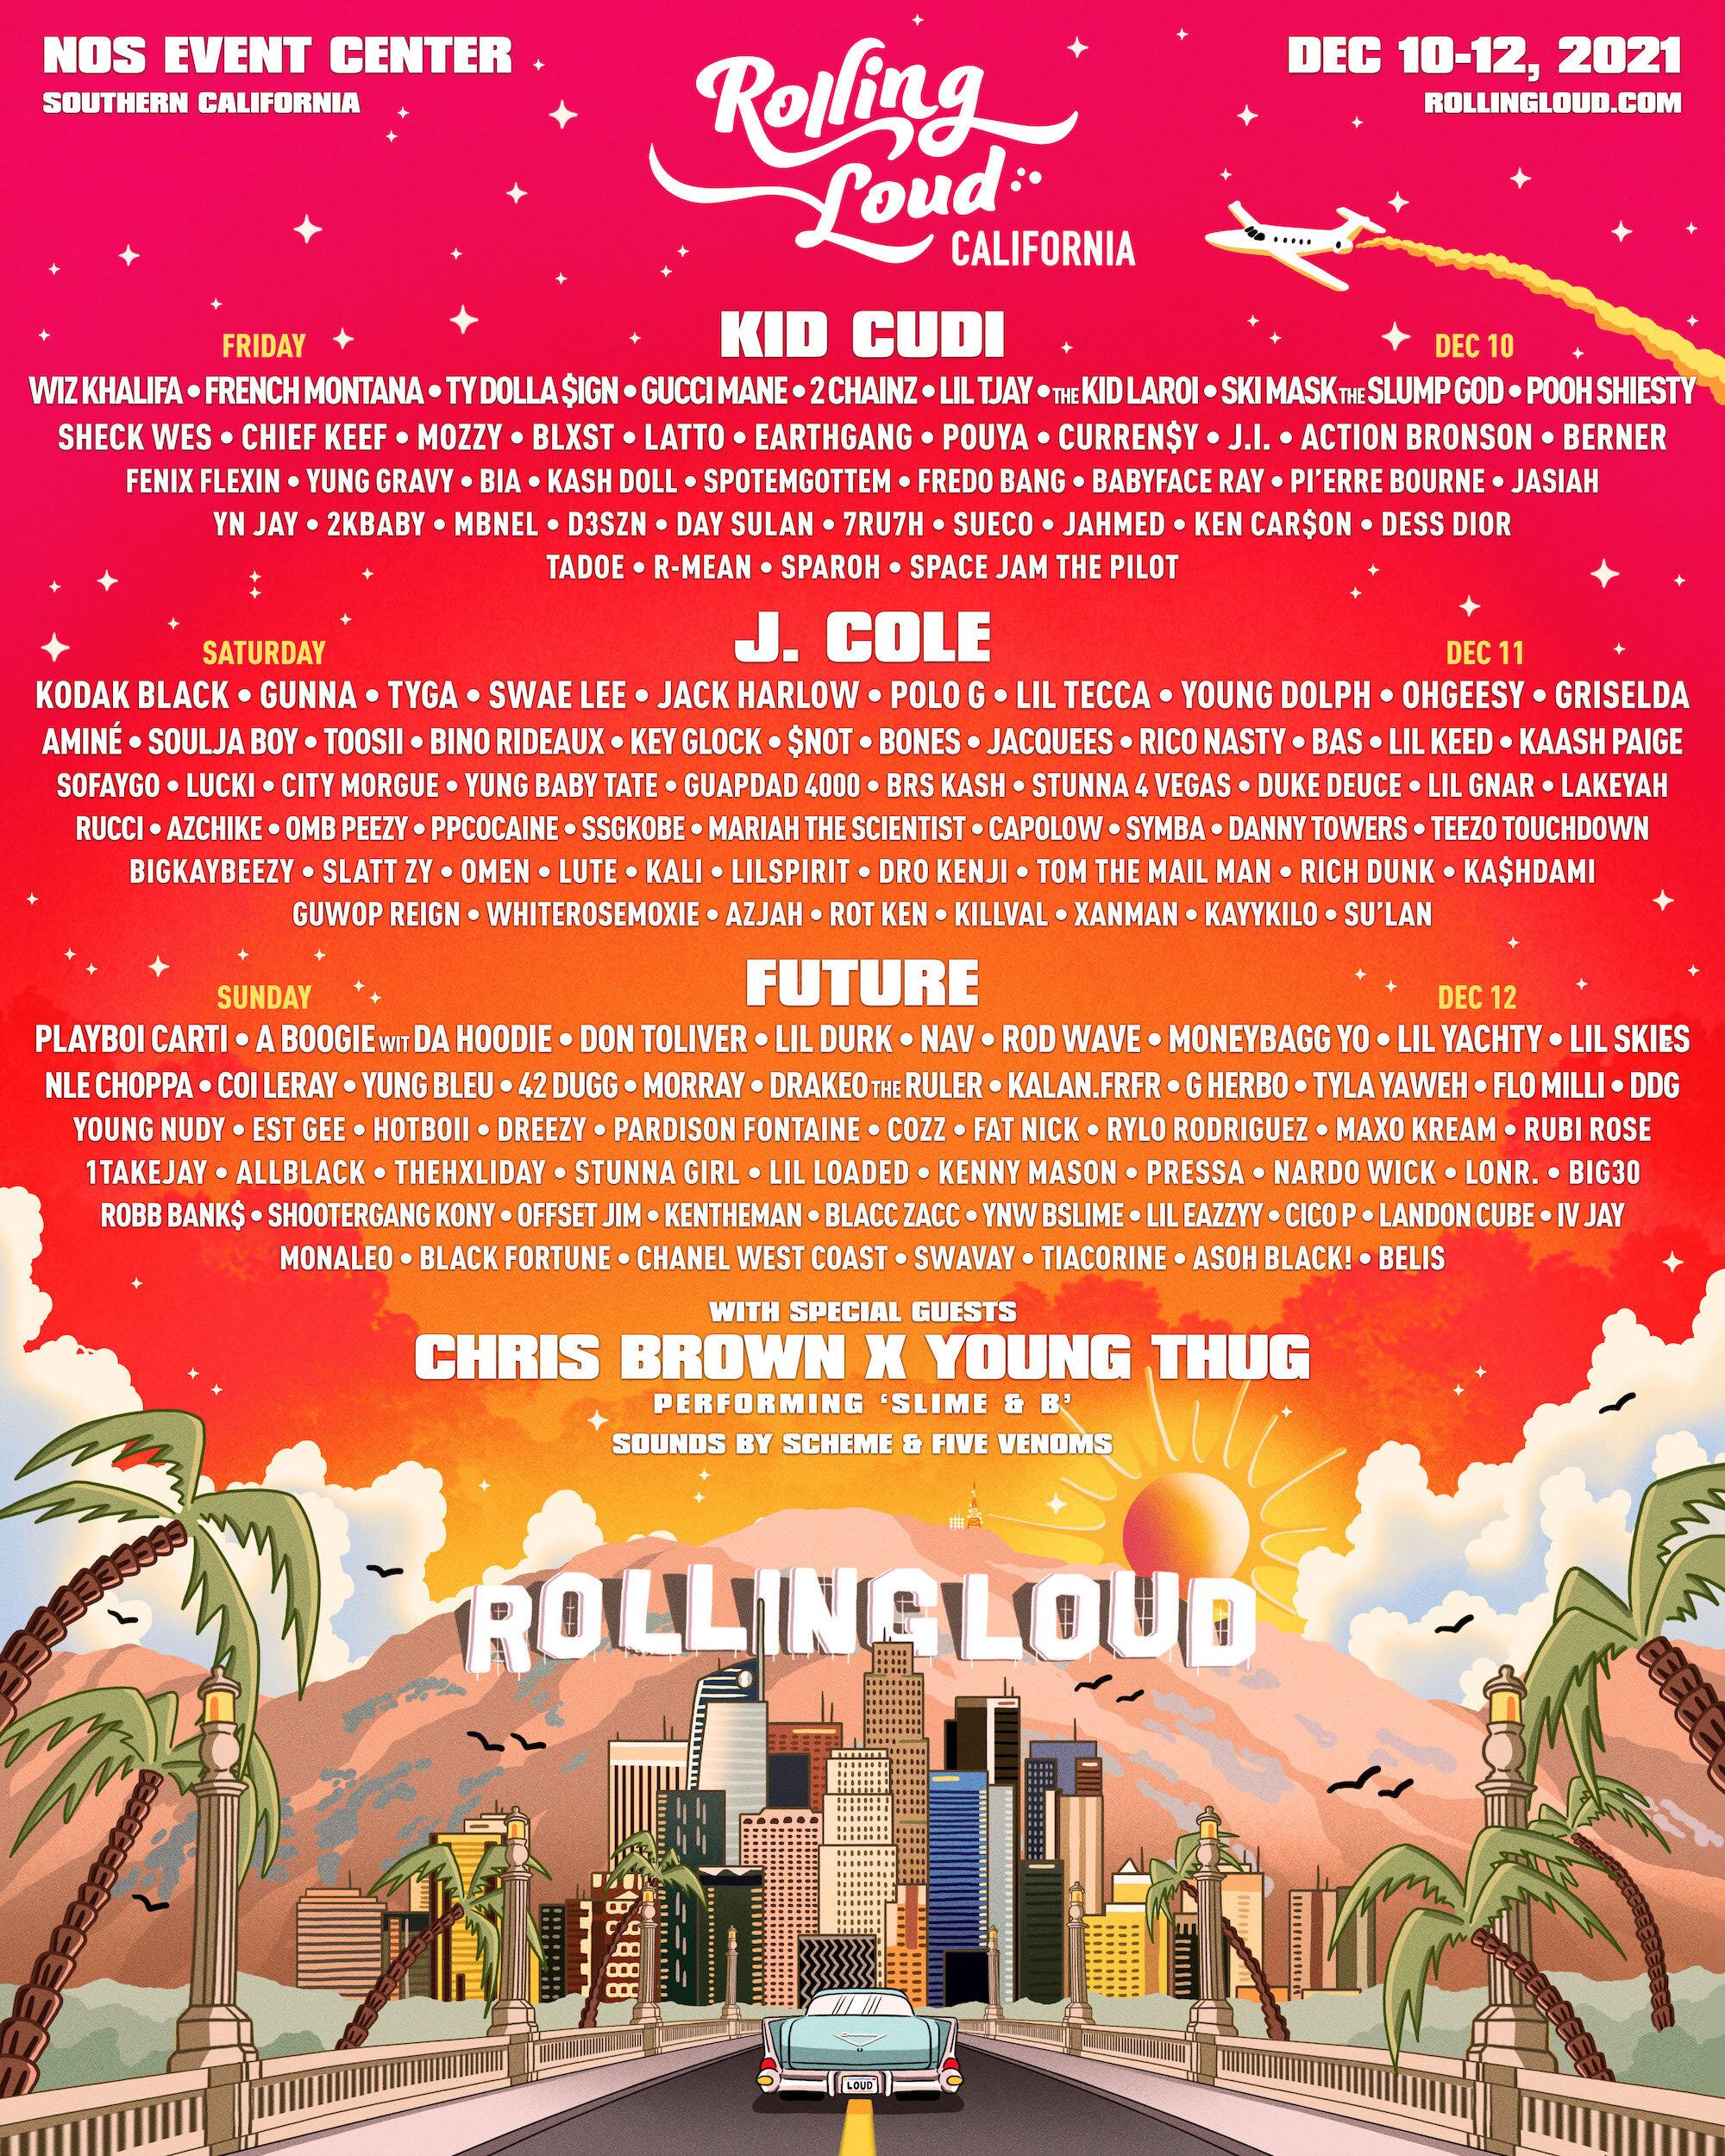 rolling loud lineup 2021